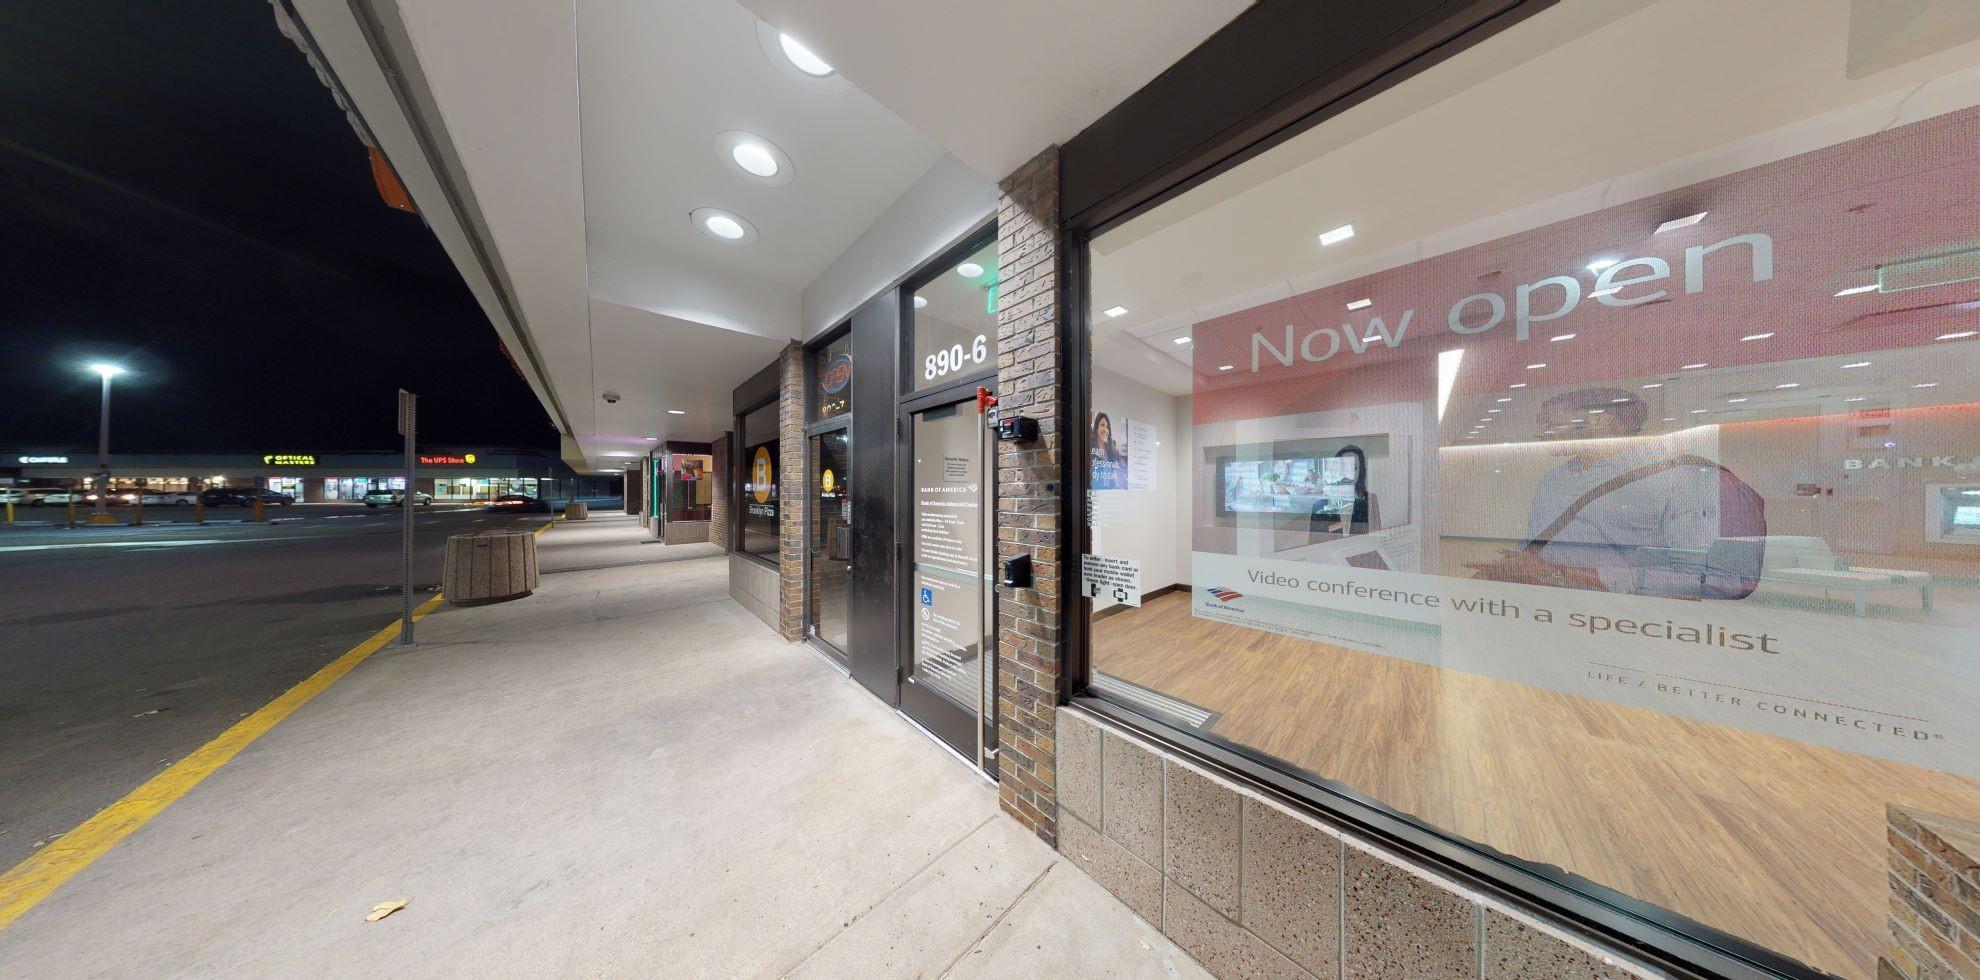 Bank of America Advanced Center with walk-up ATM | 890 S Monaco Pkwy STE 6, Denver, CO 80224